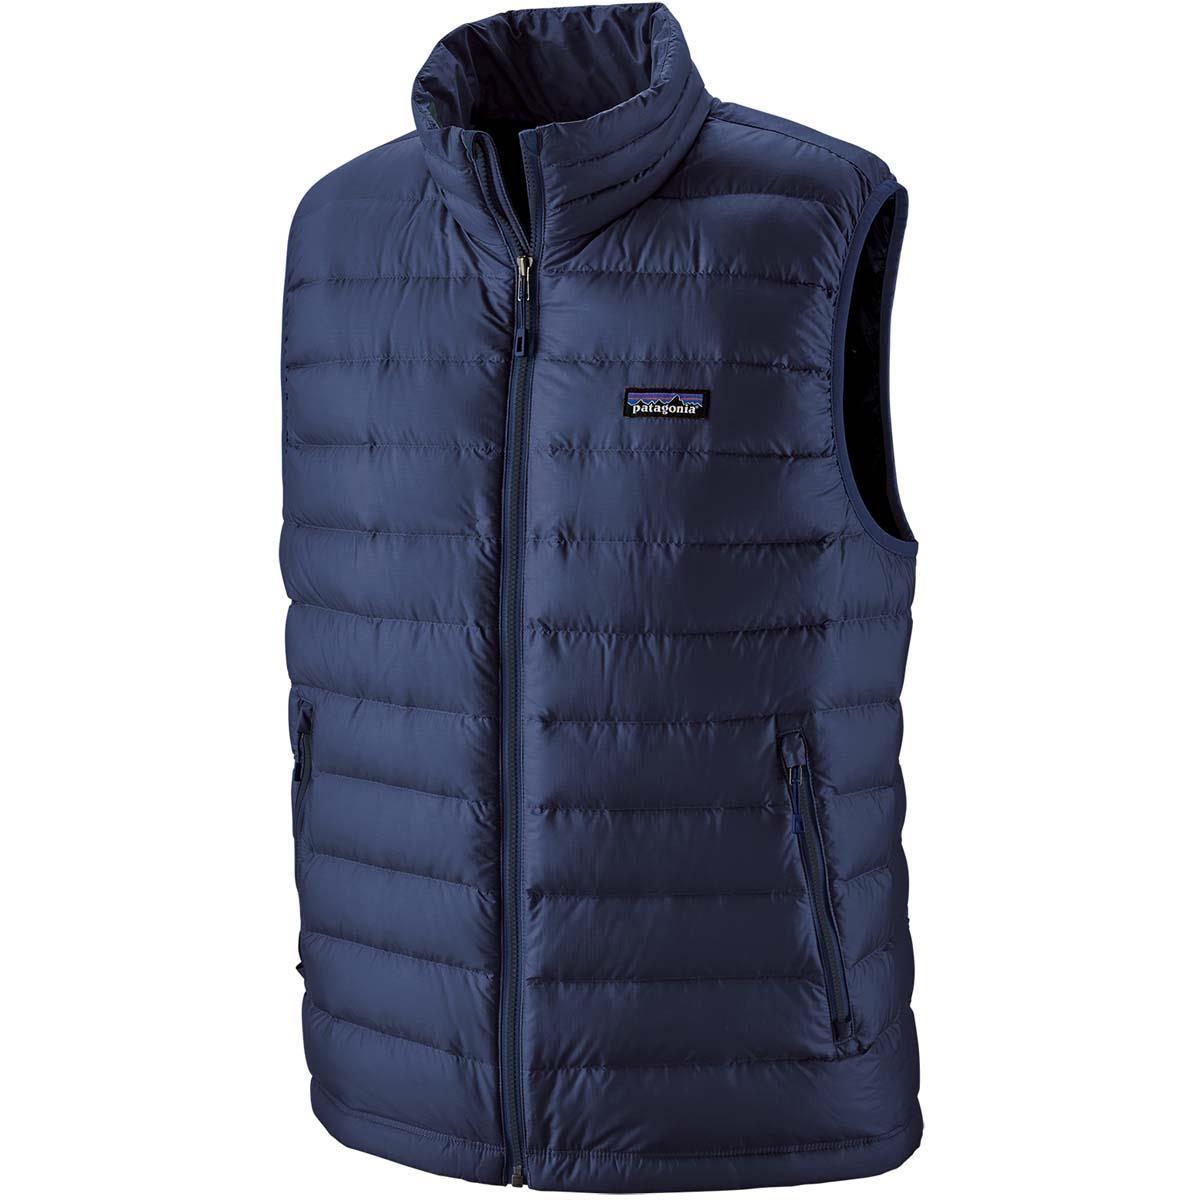 6893830da99 Patagonia Down Sweater Vest - Men's